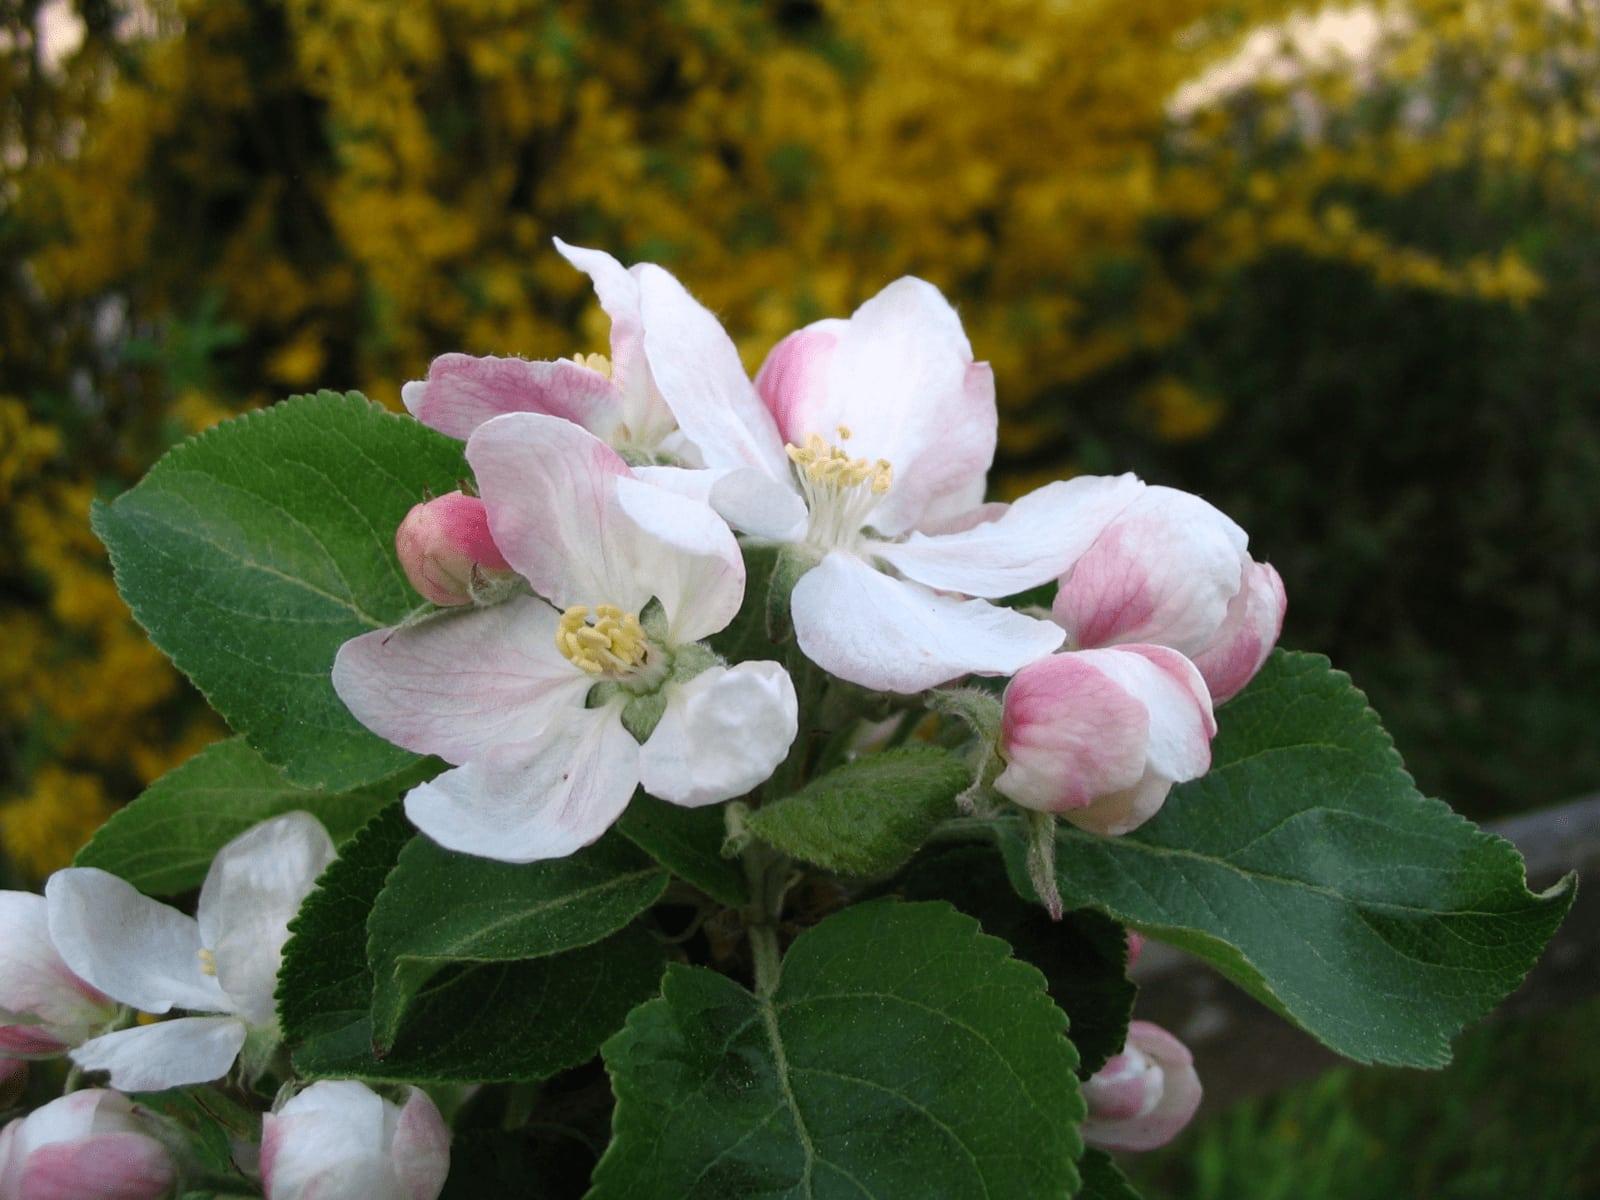 Craniosacral Heilmethode Ausbildung + Kurse Vöckelsbach Apfelblüte